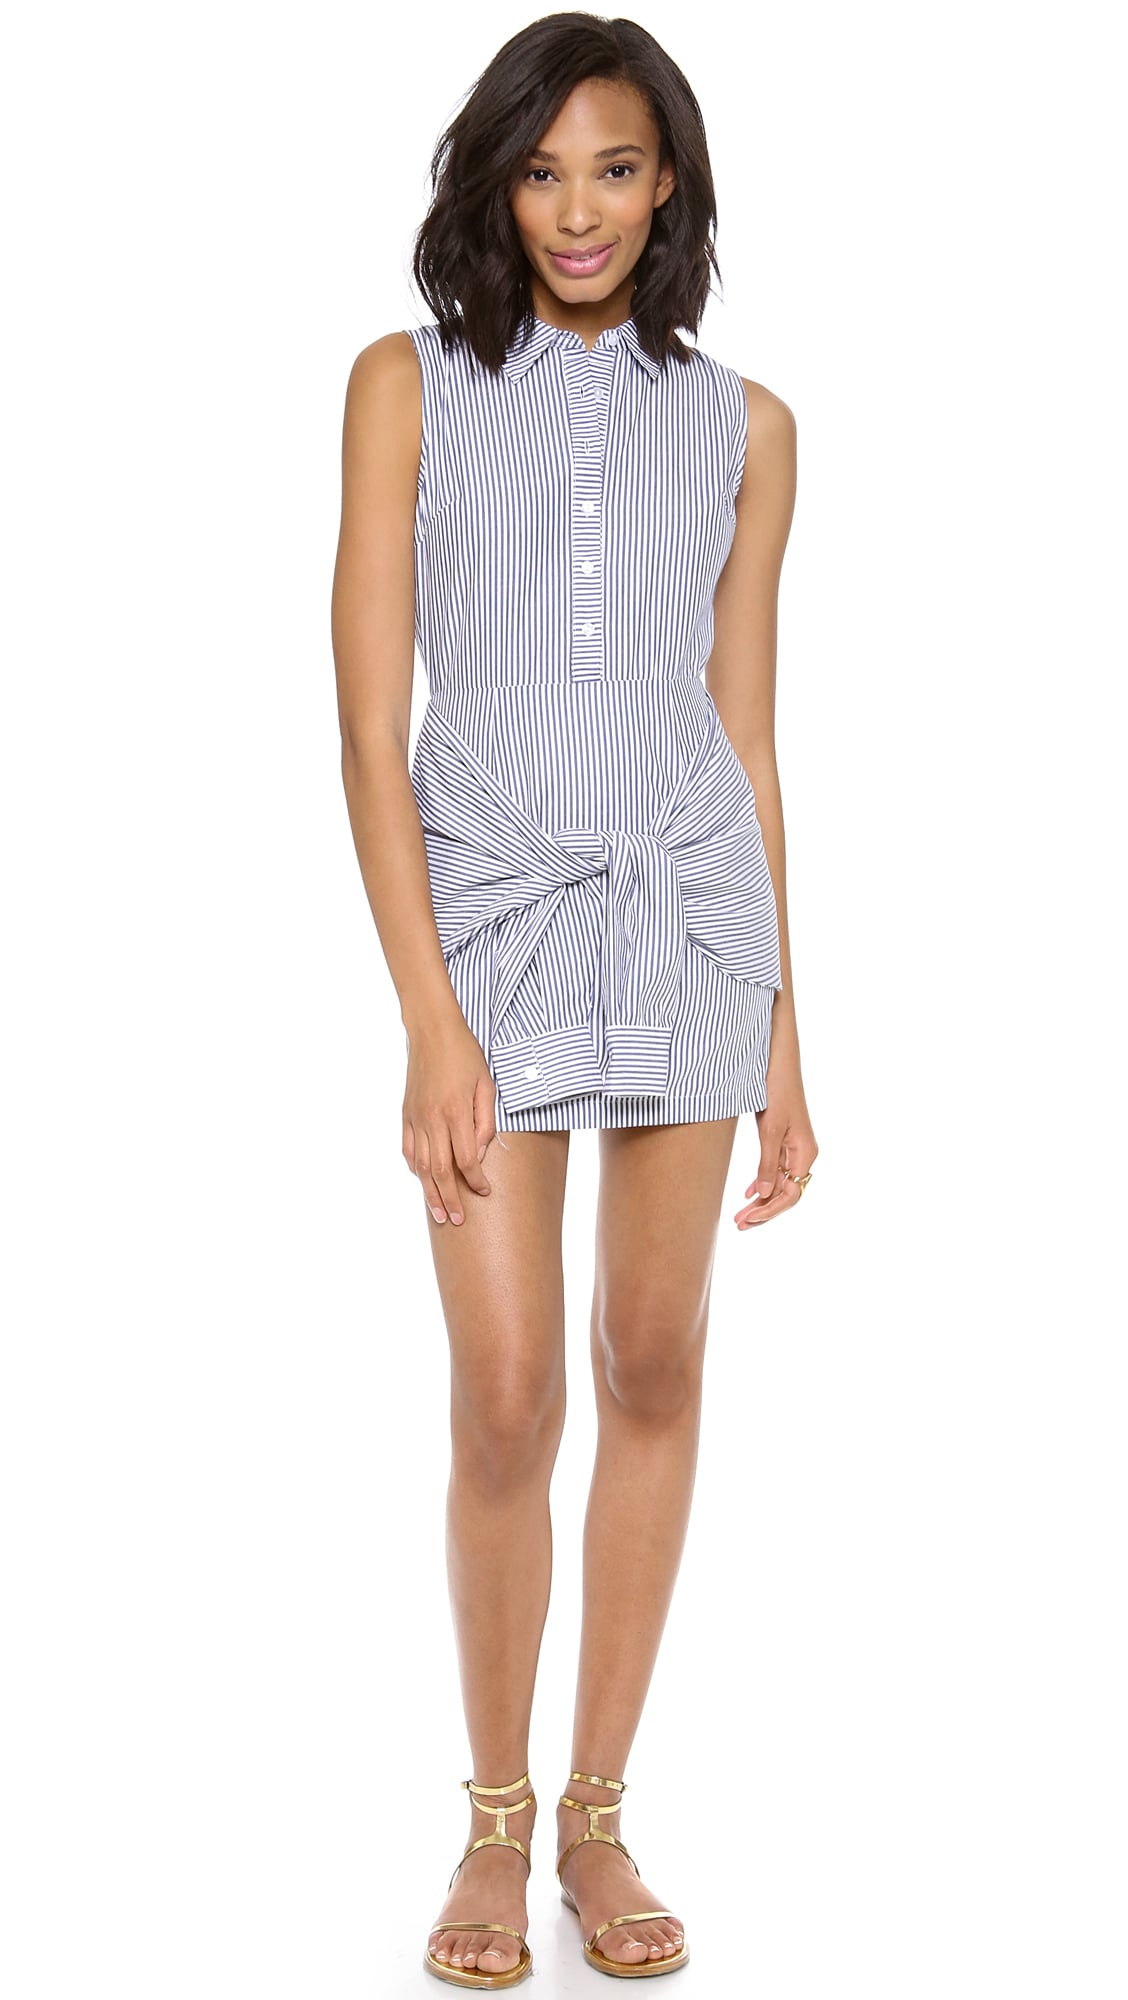 JOA Shirtdress